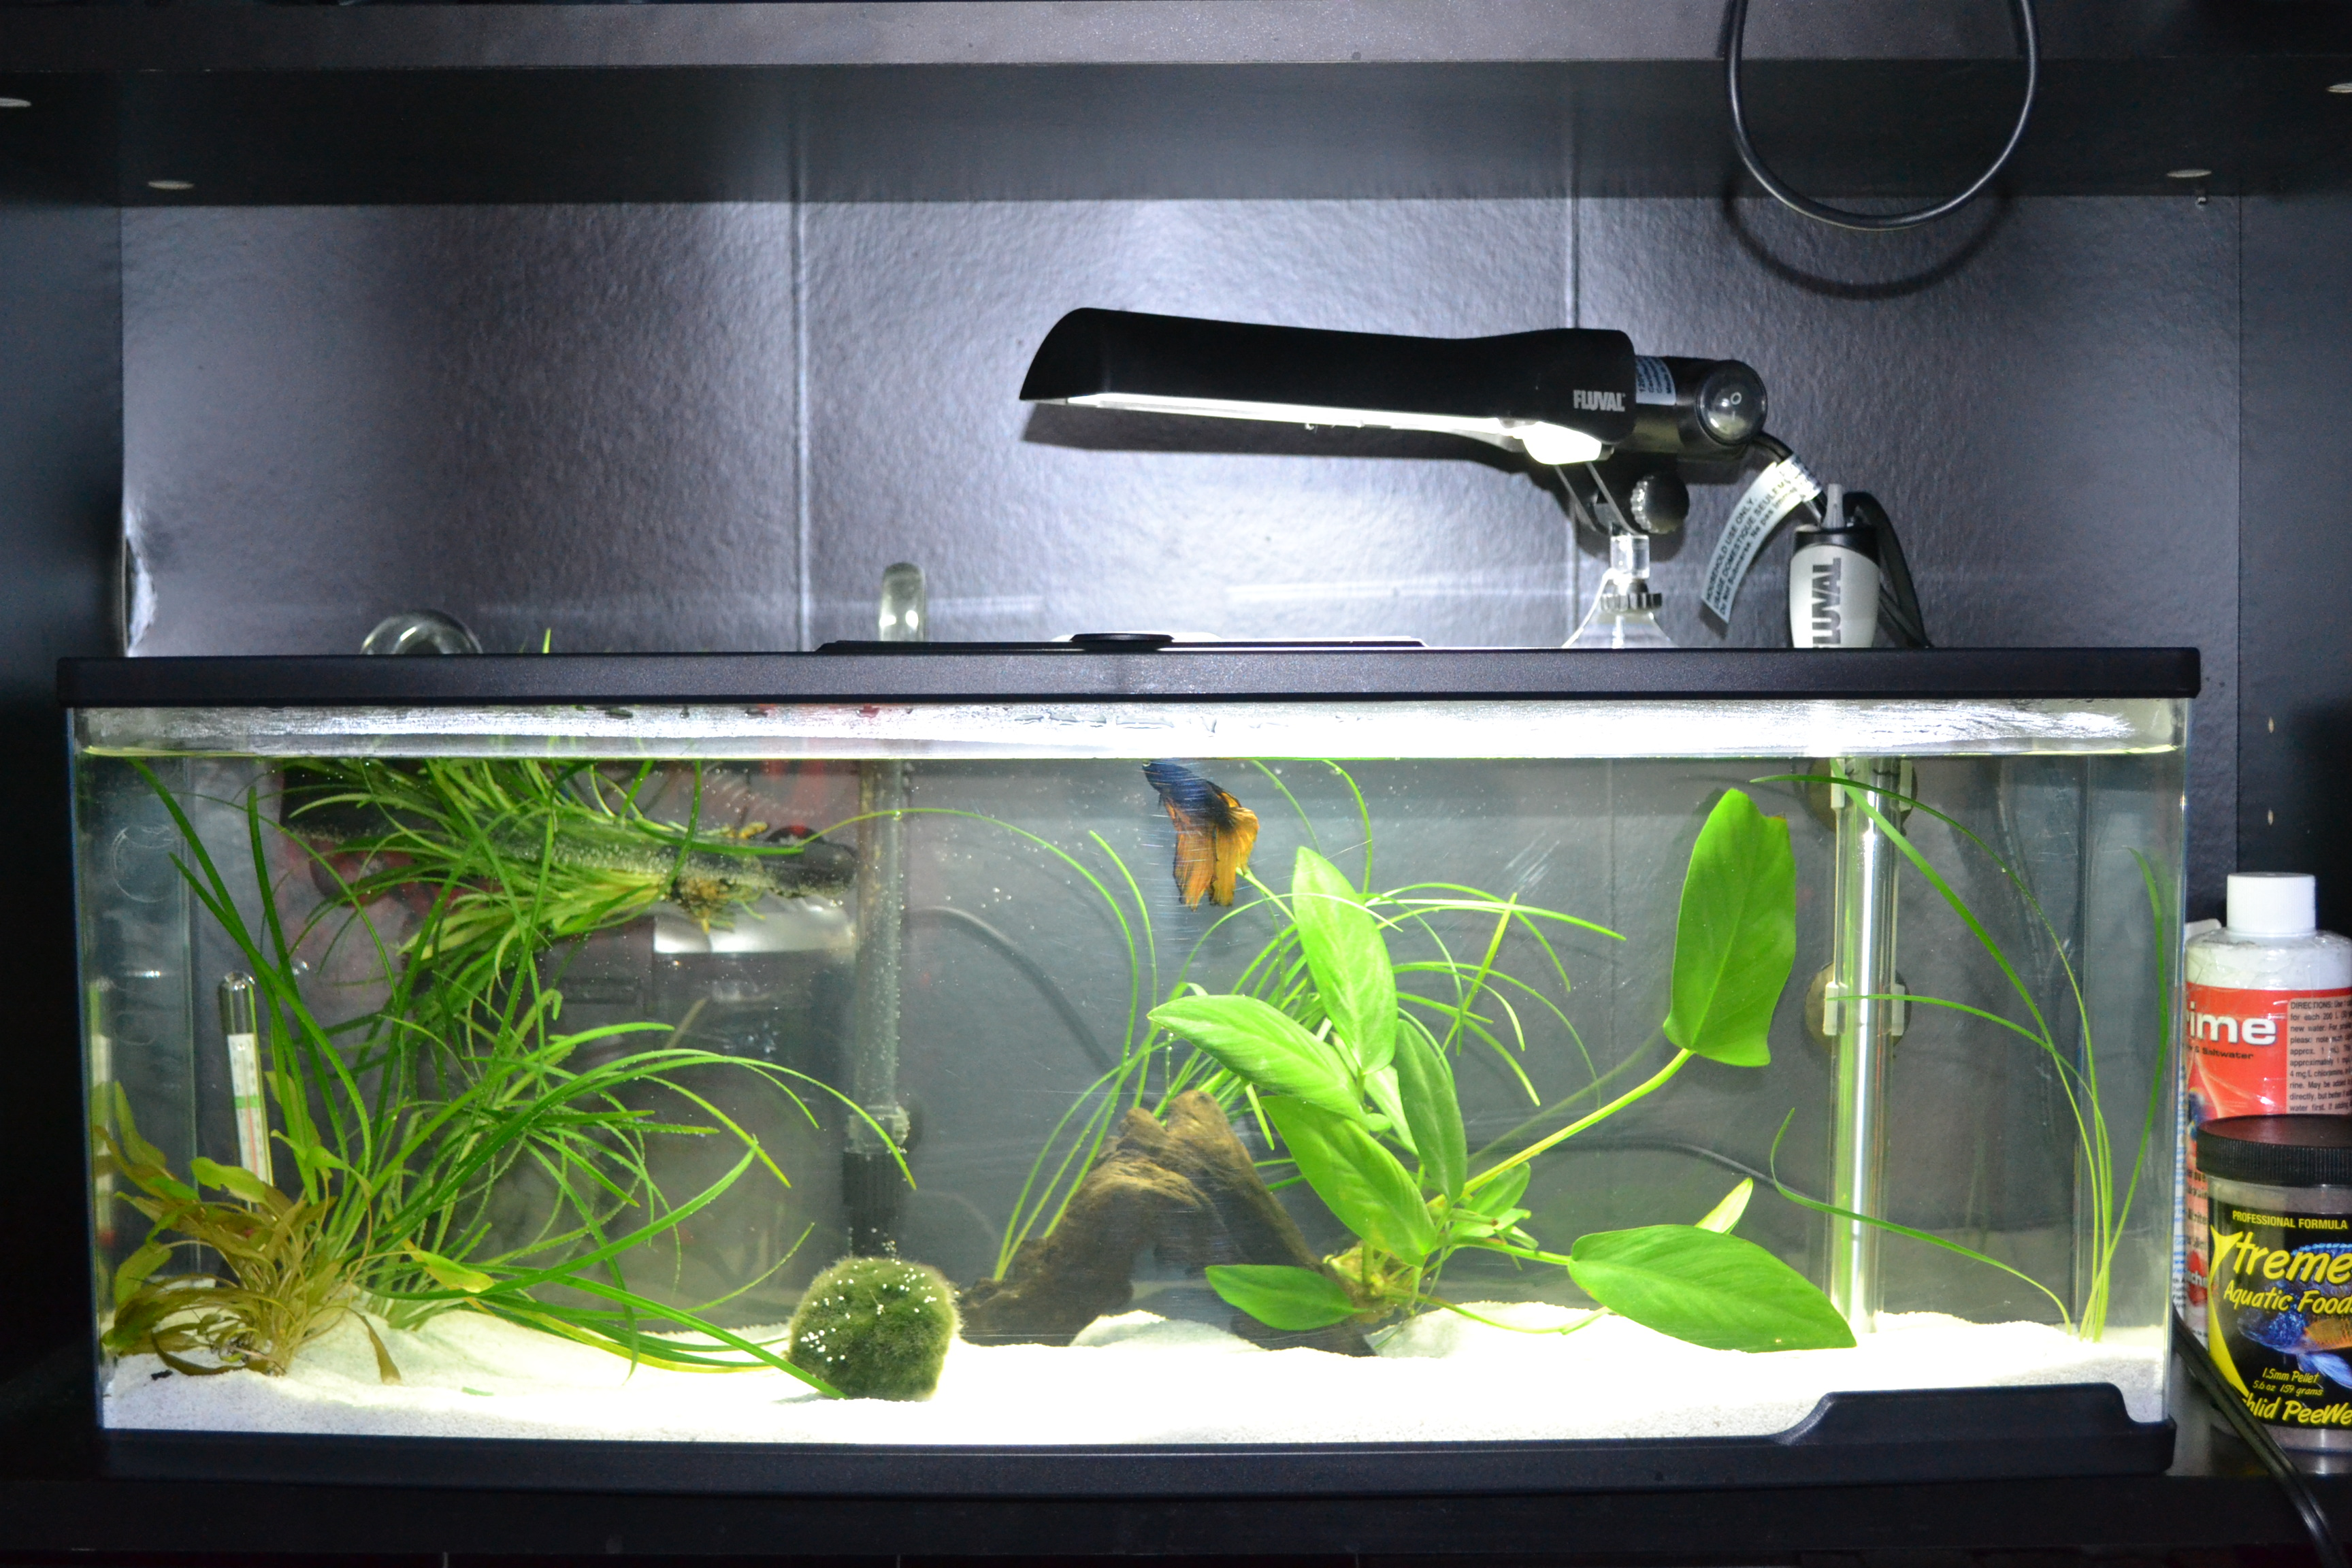 Ideal betta setup by notoriousbunny on deviantart for Betta fish tank temperature